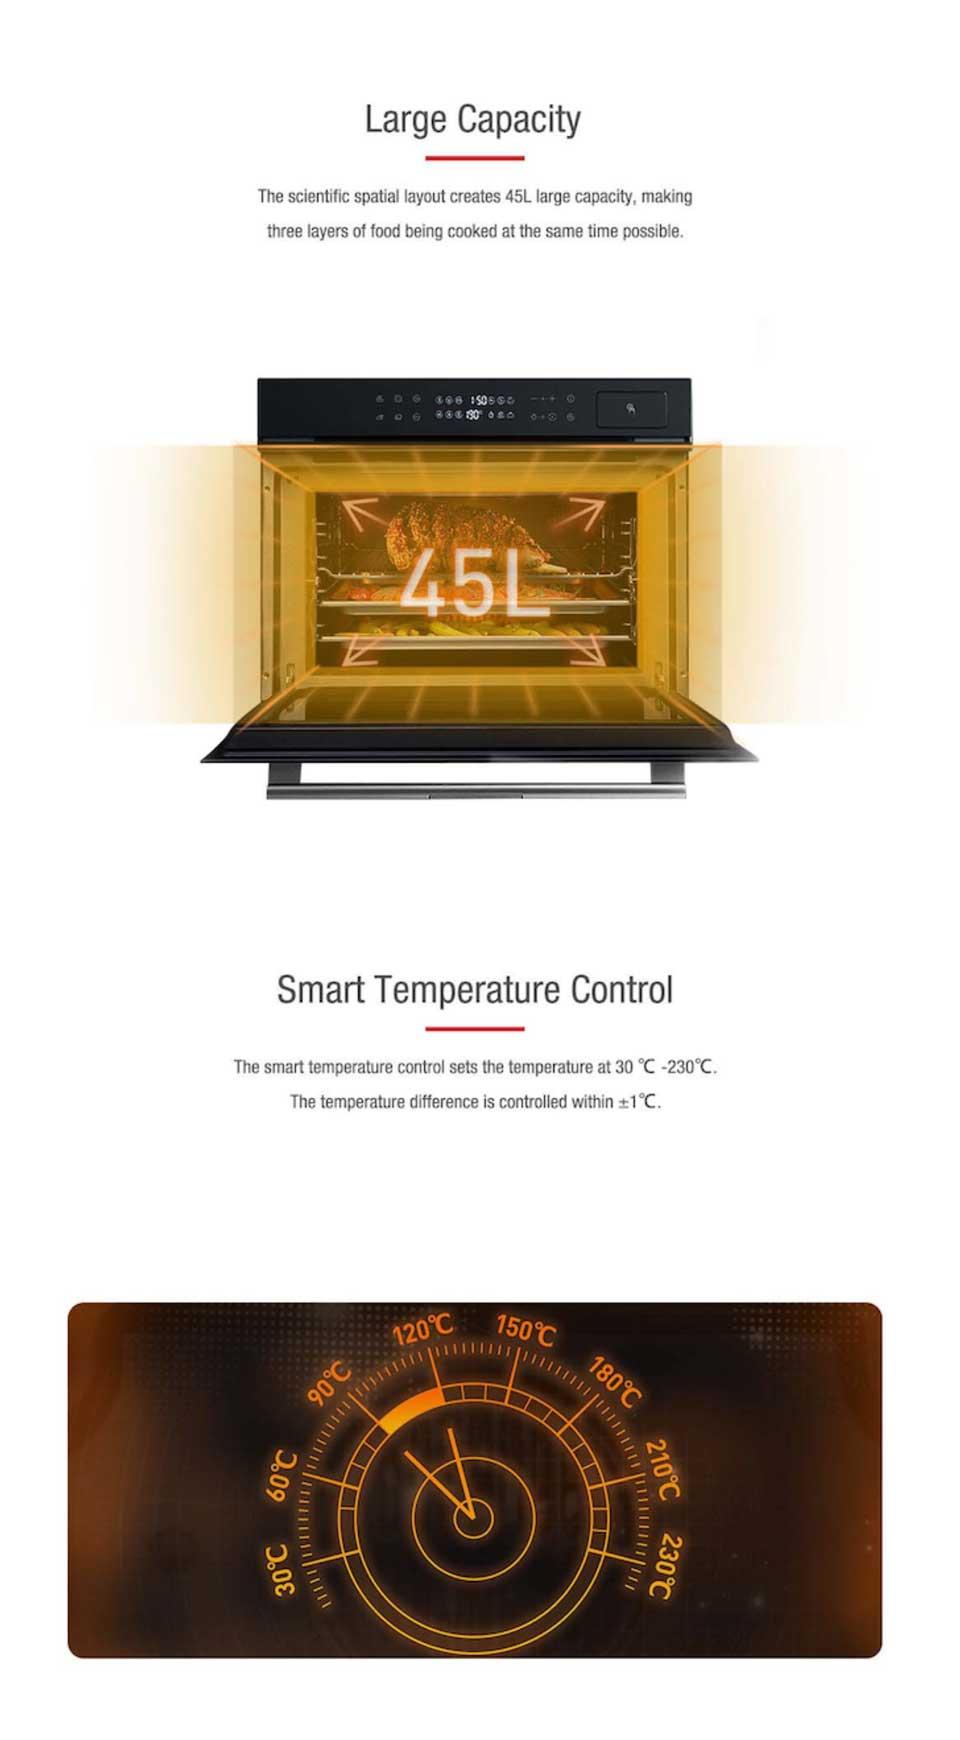 45cm series DE&E ZK4585 45 liters big capacity smart temperature combi steam grill oven